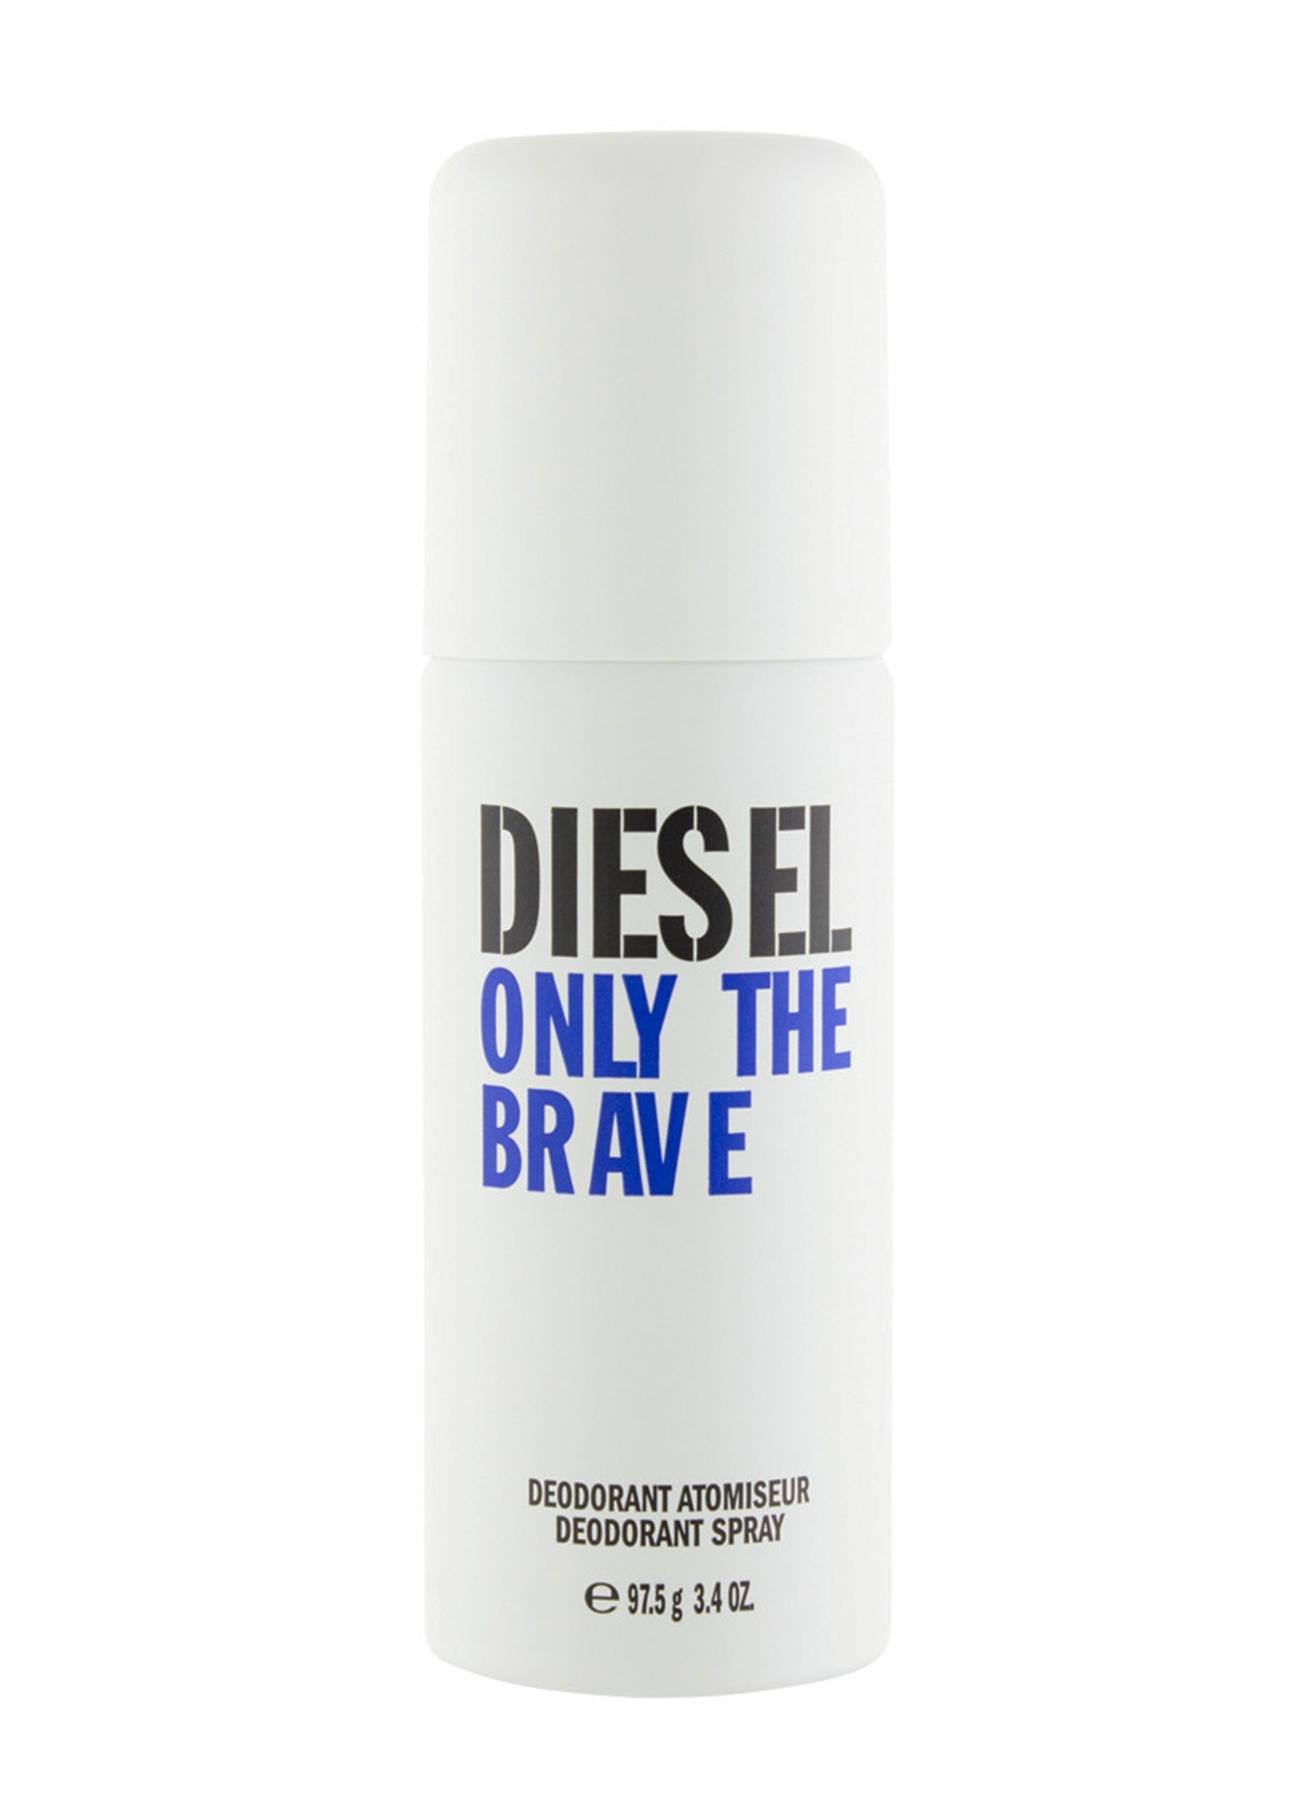 Diesel Only The Brave Deodorant Spray 150ml